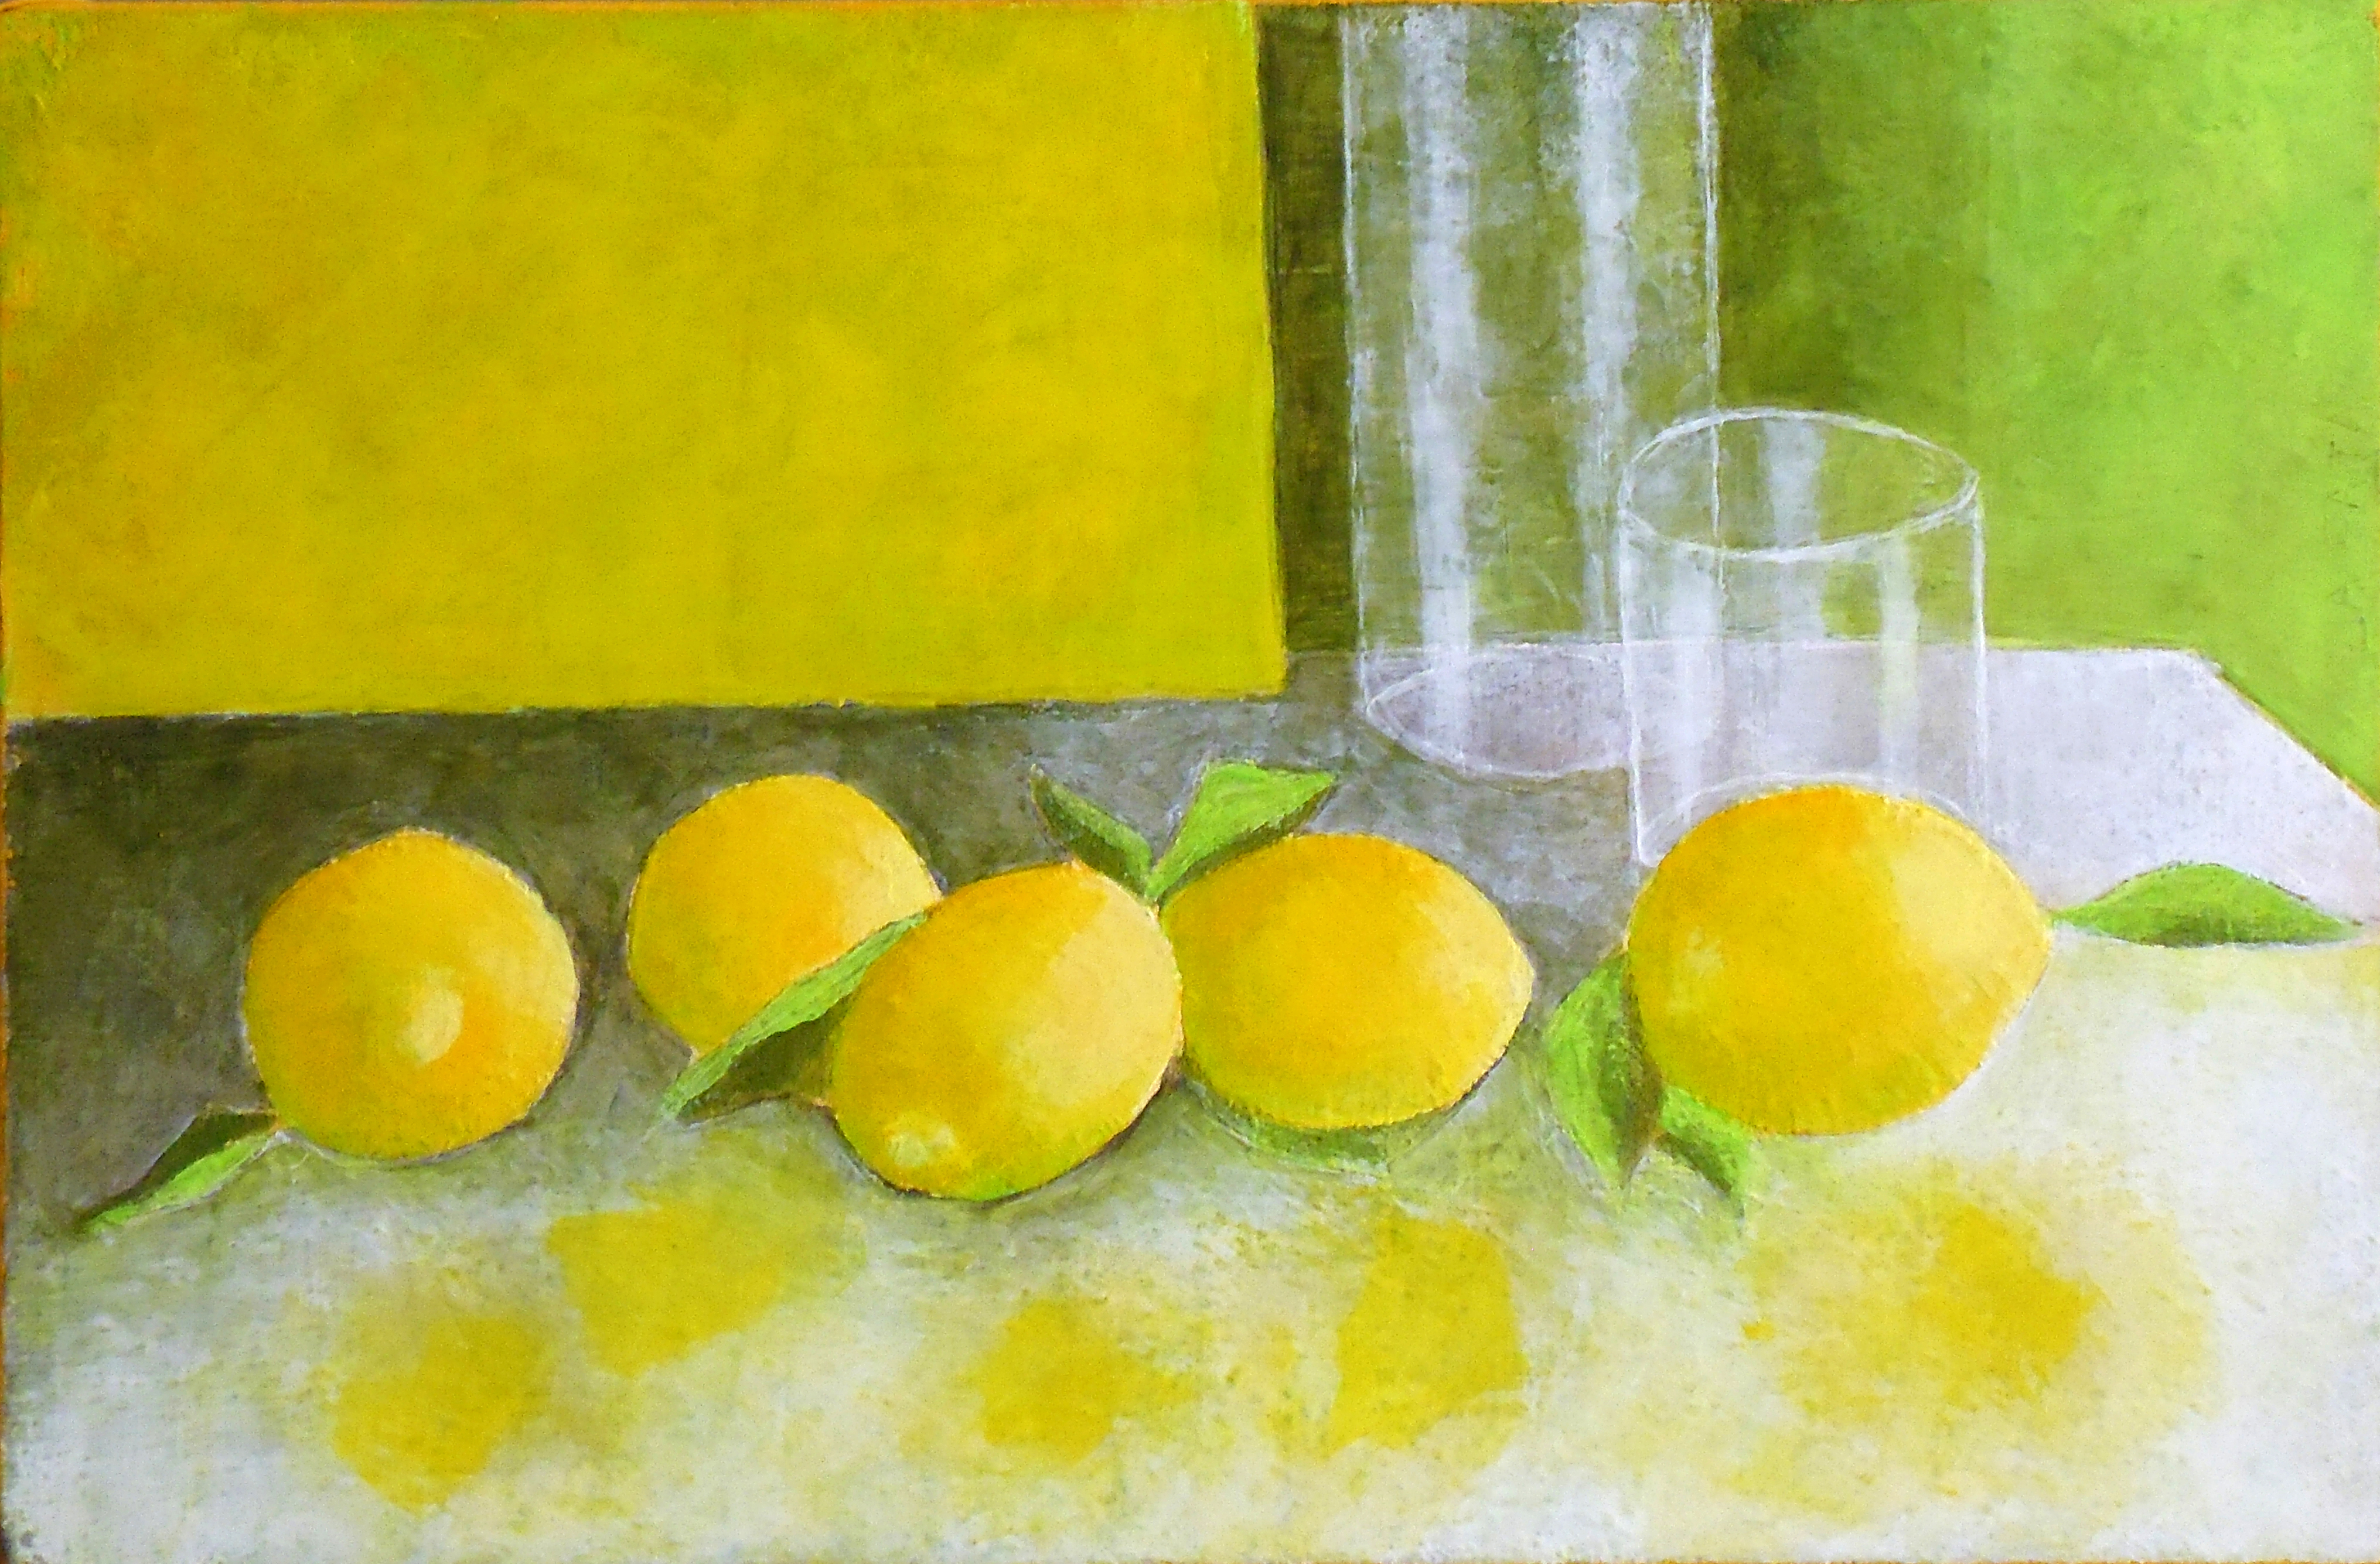 Still life / yellow